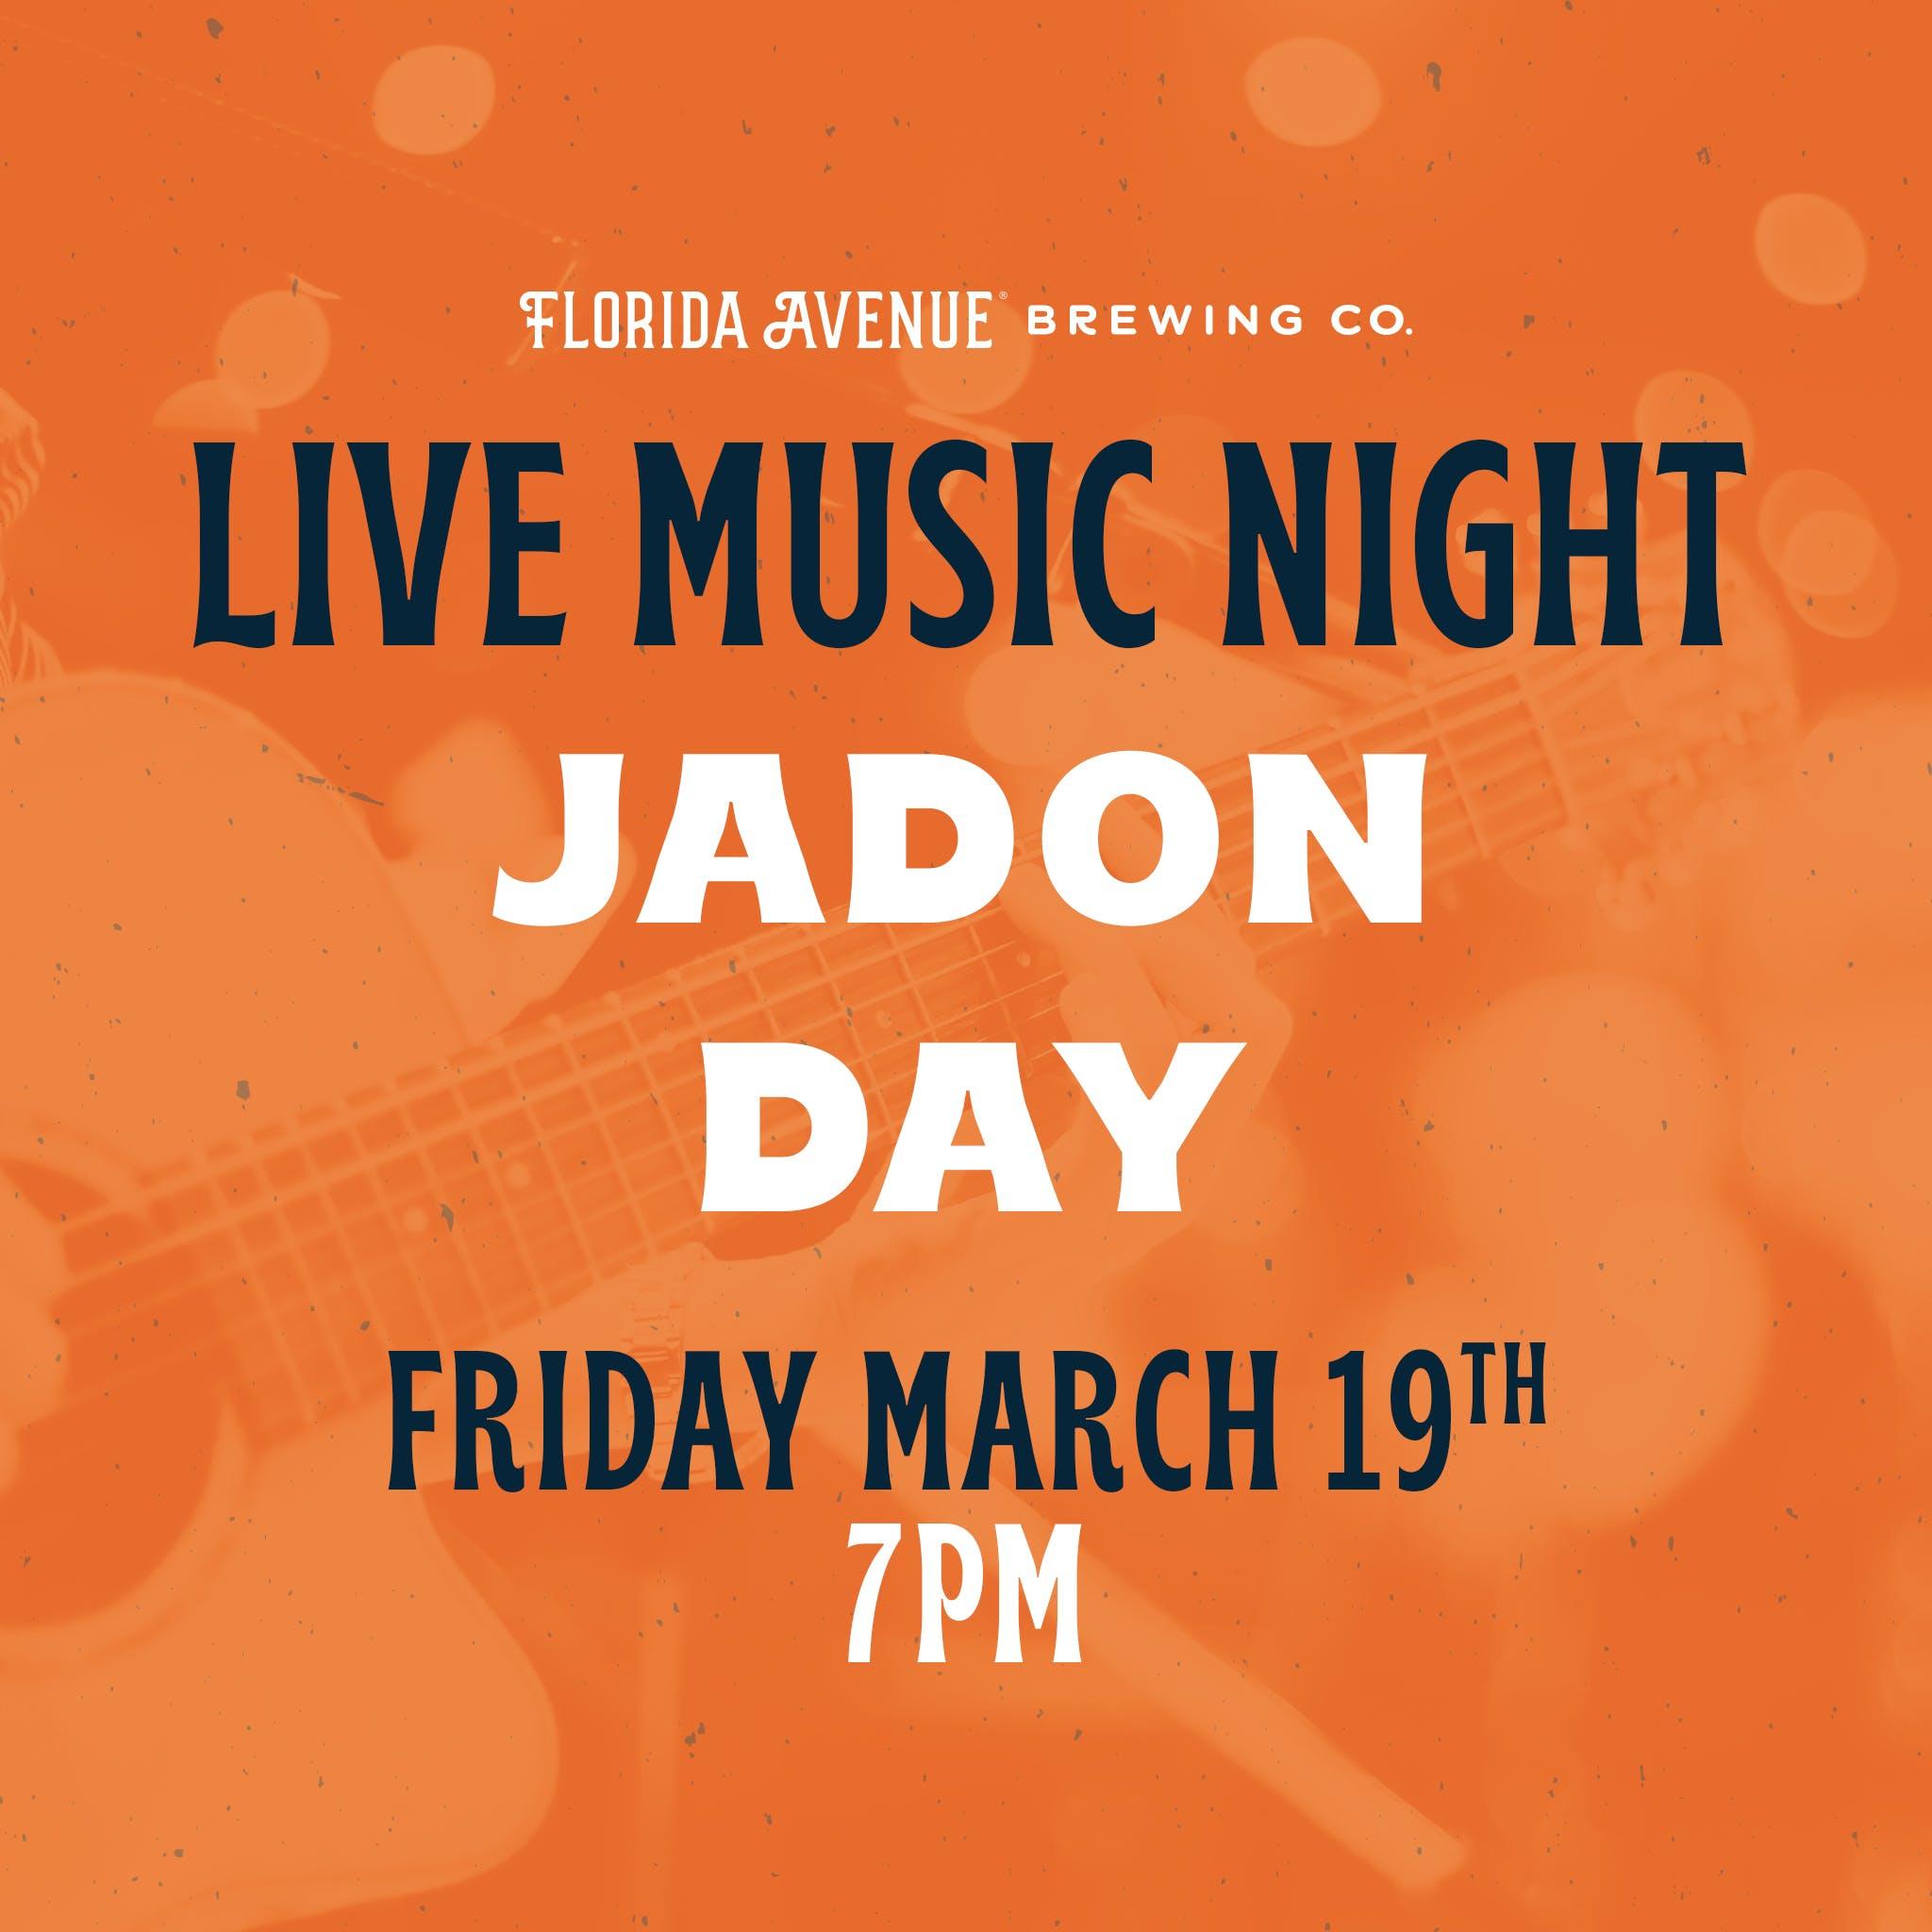 jadon day